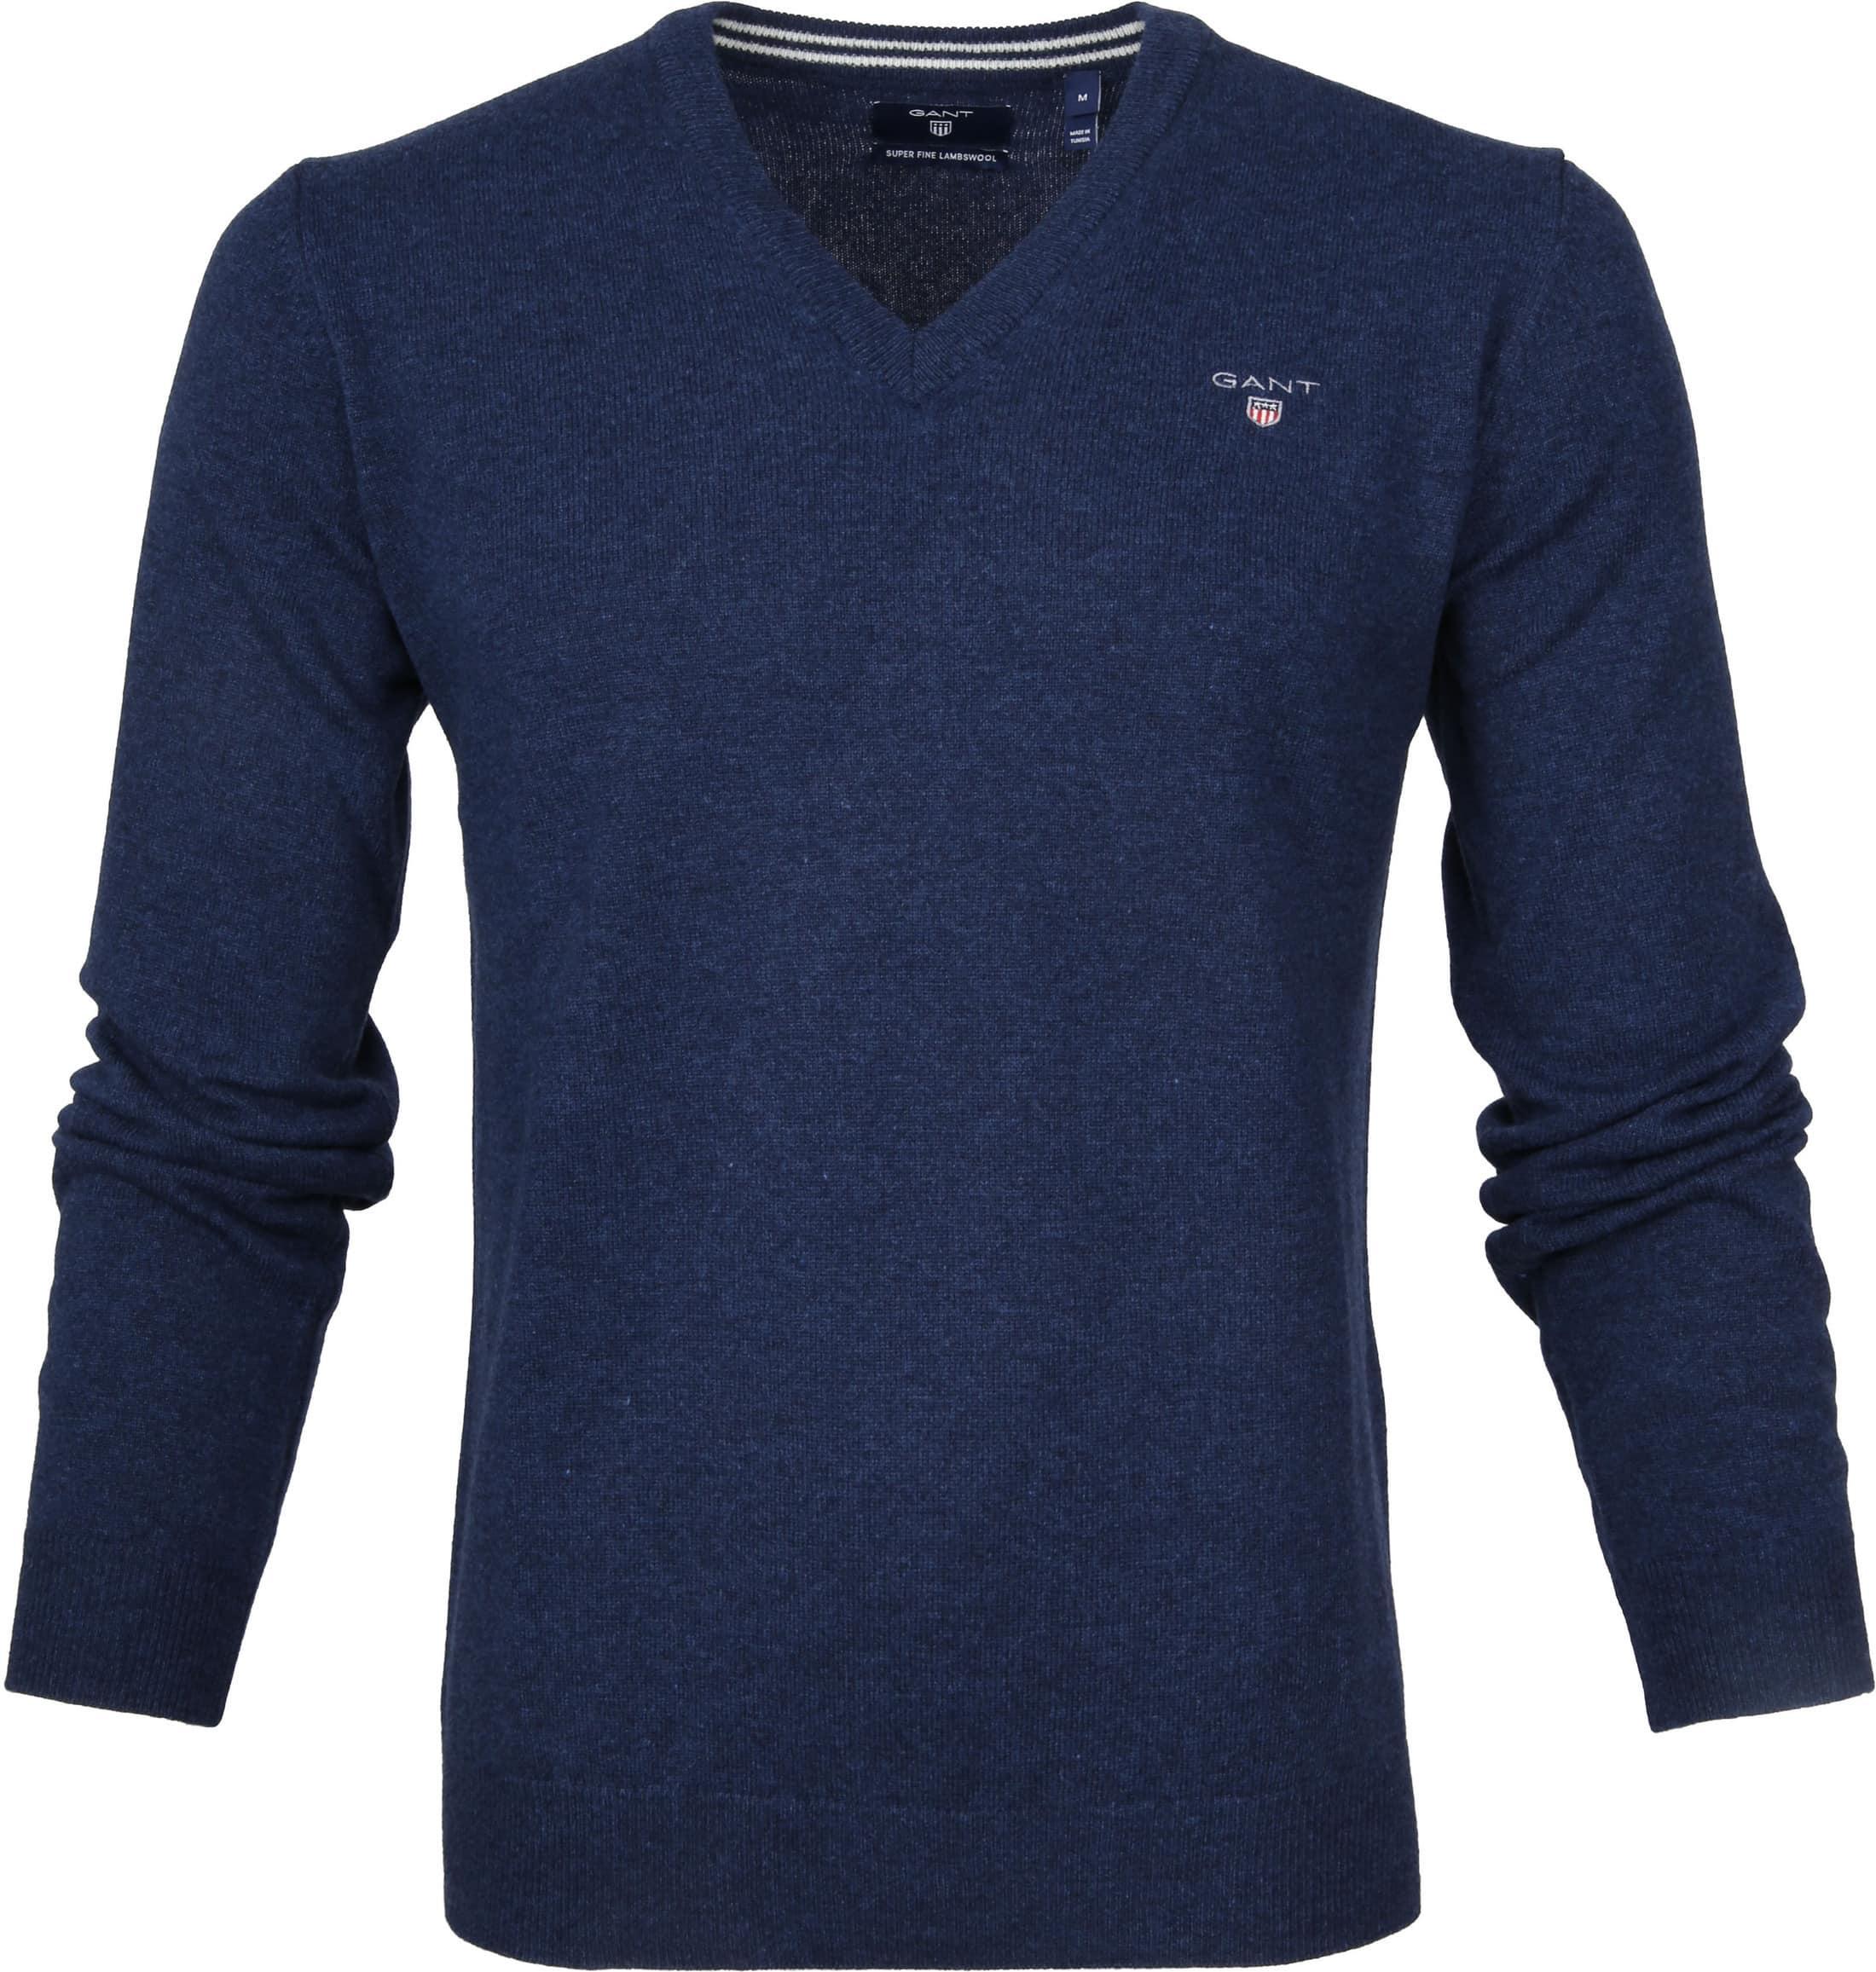 Gant Pullover Lamswol Blauw foto 0